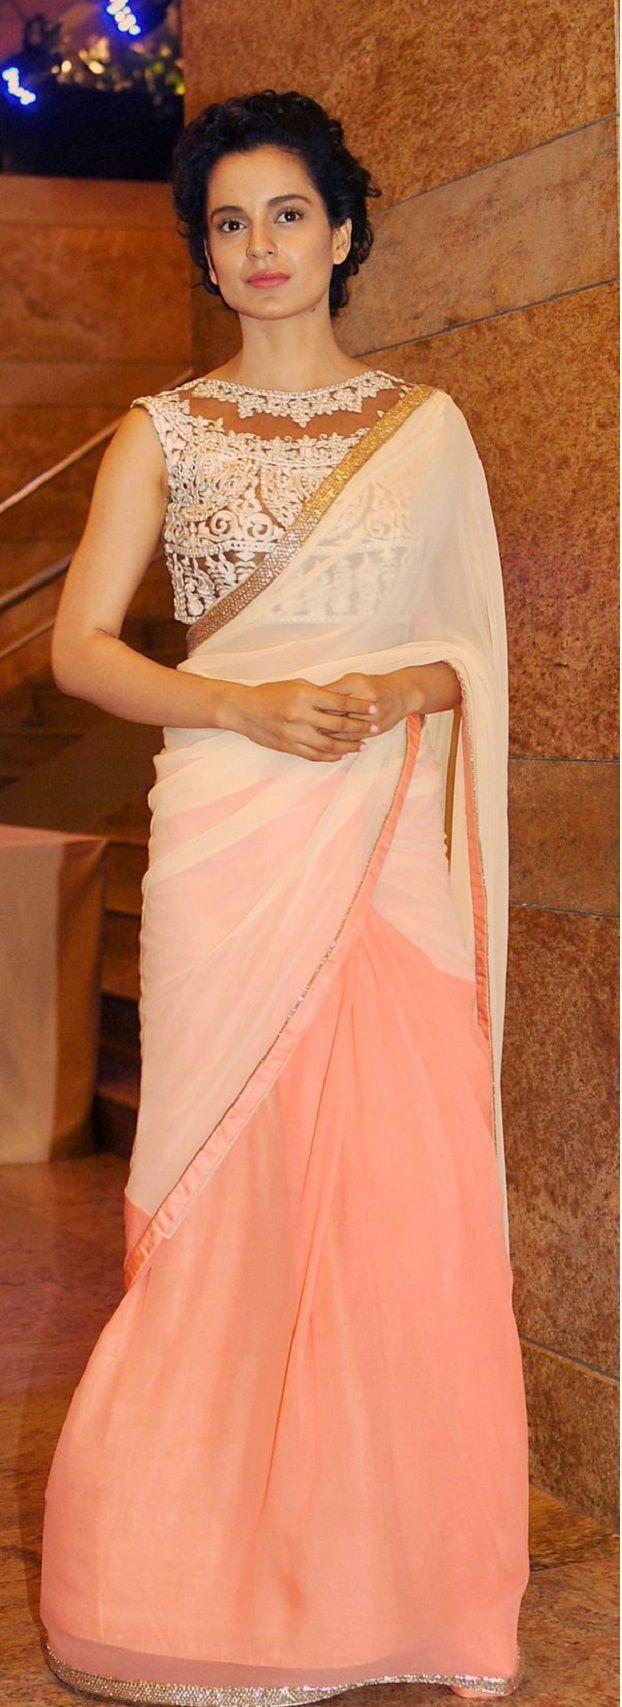 Kangana Ranaut  peach sari is wedding worthy